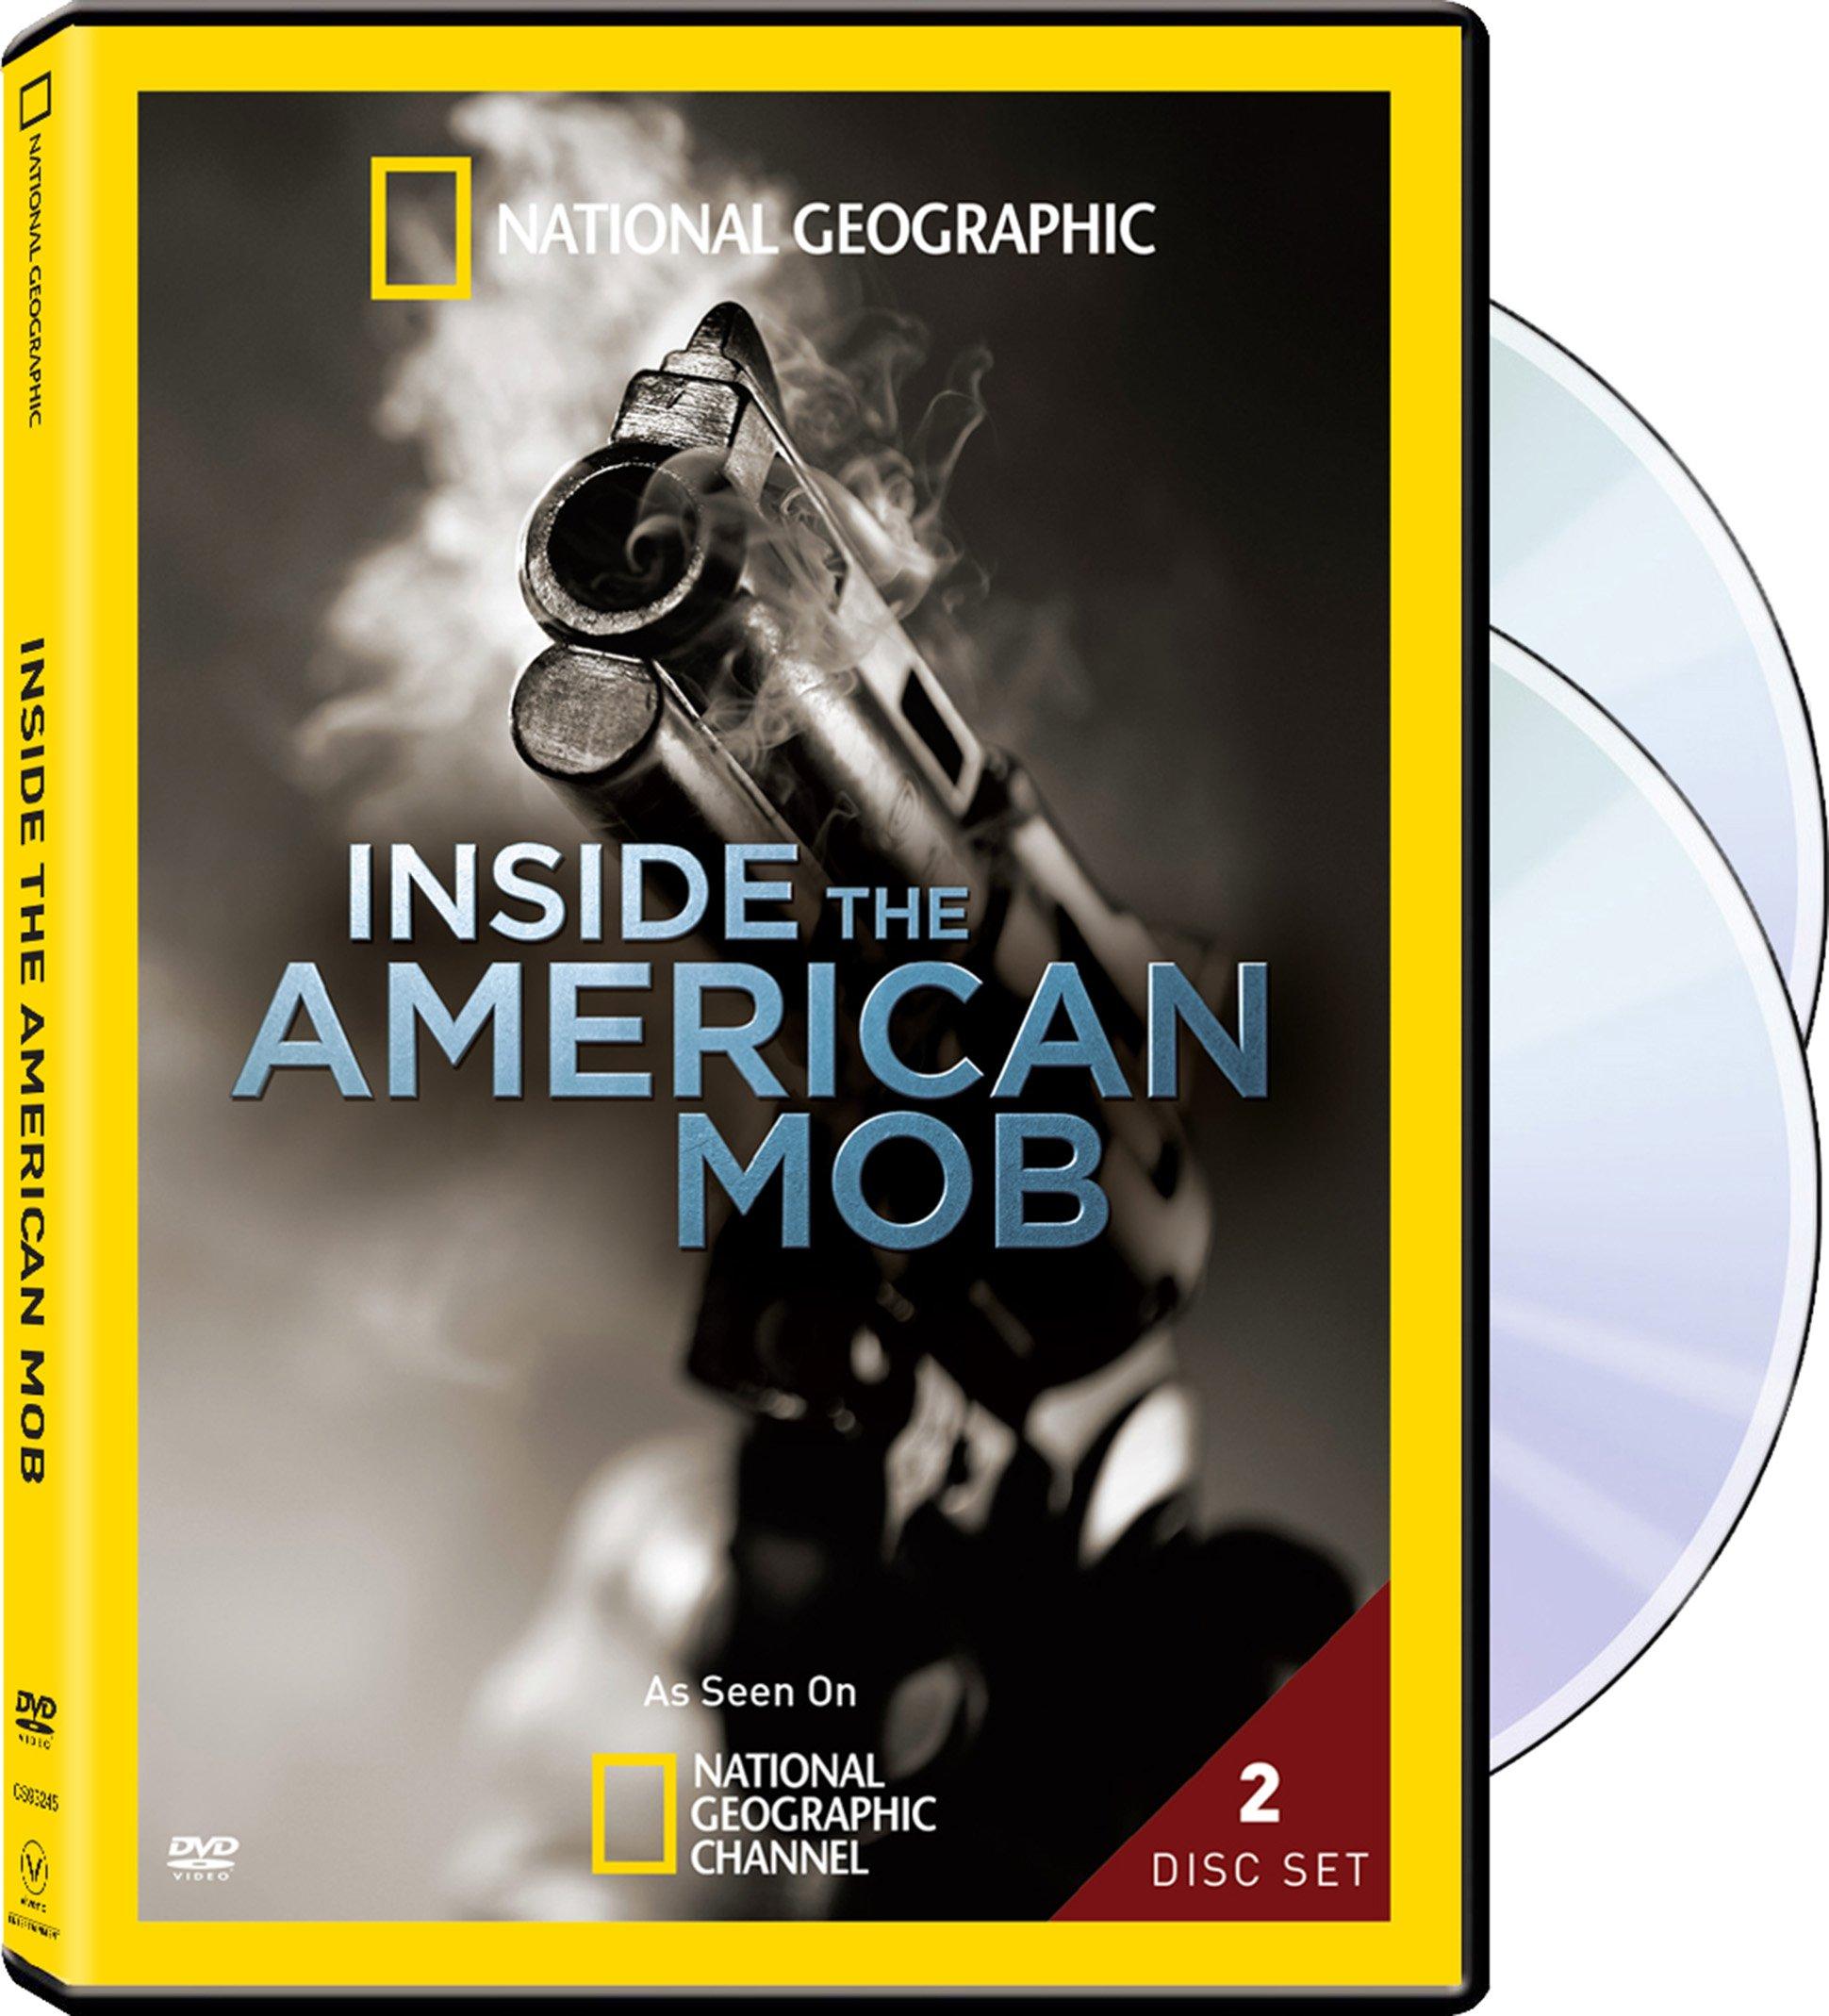 Inside the American Mob Season 1, The